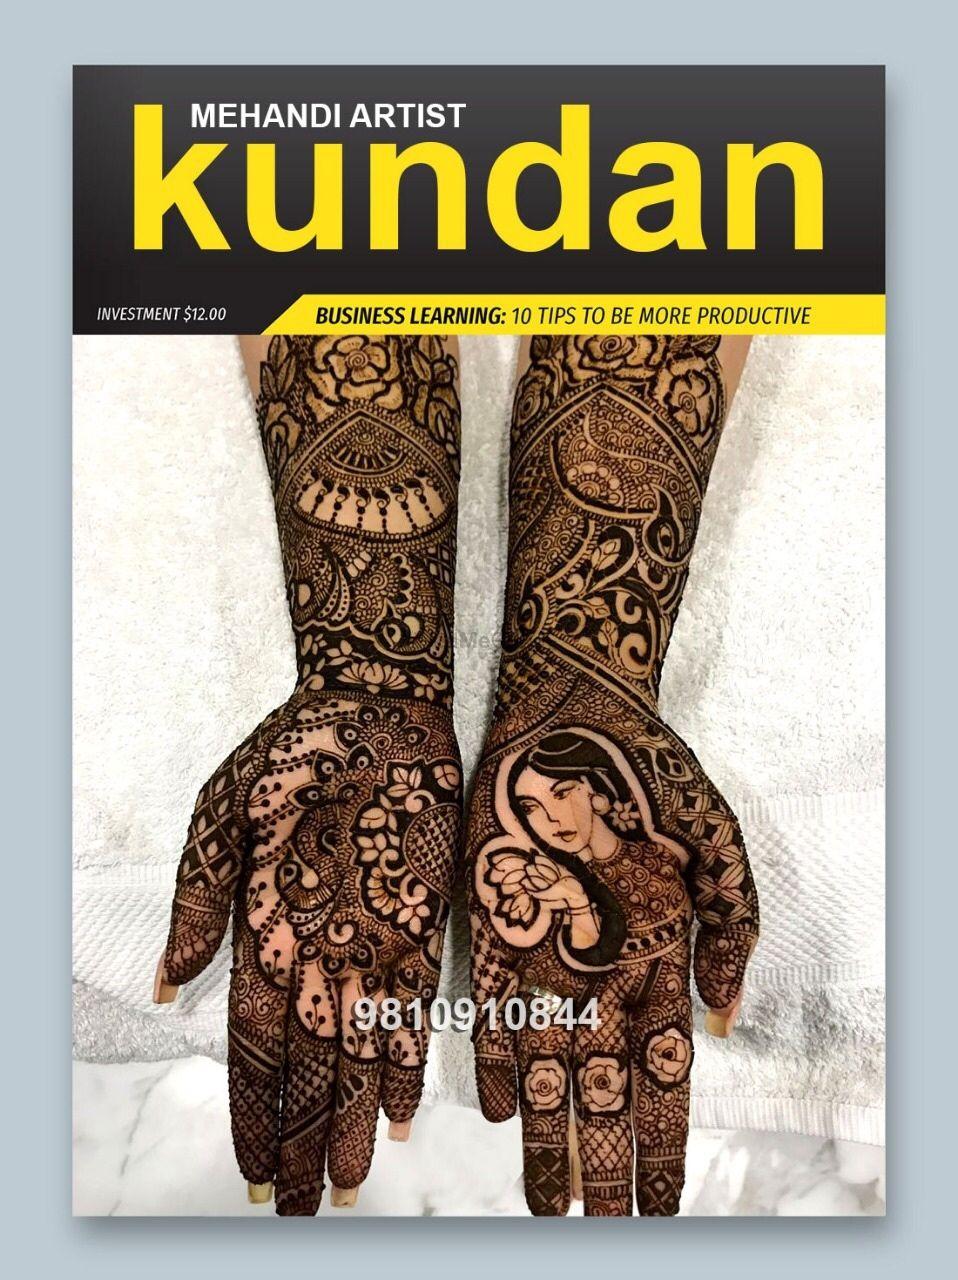 Photo By Kundan Mehendi Artist - Mehendi Artist